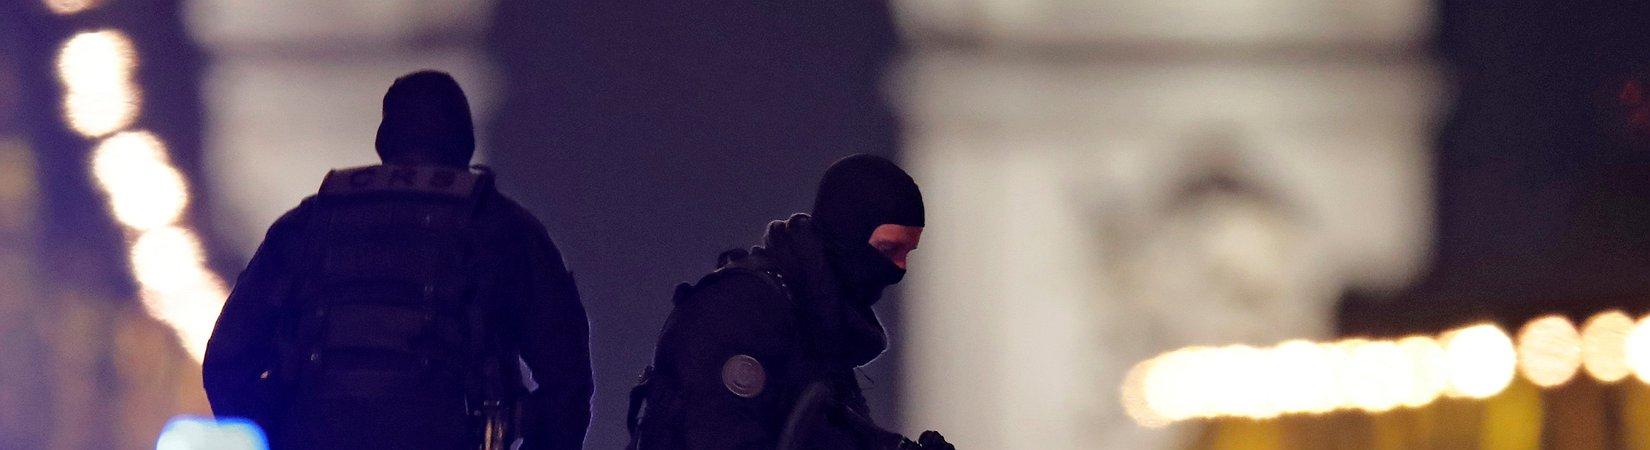 L'Isis rivendica l'attentato sugli Champs-Elysées